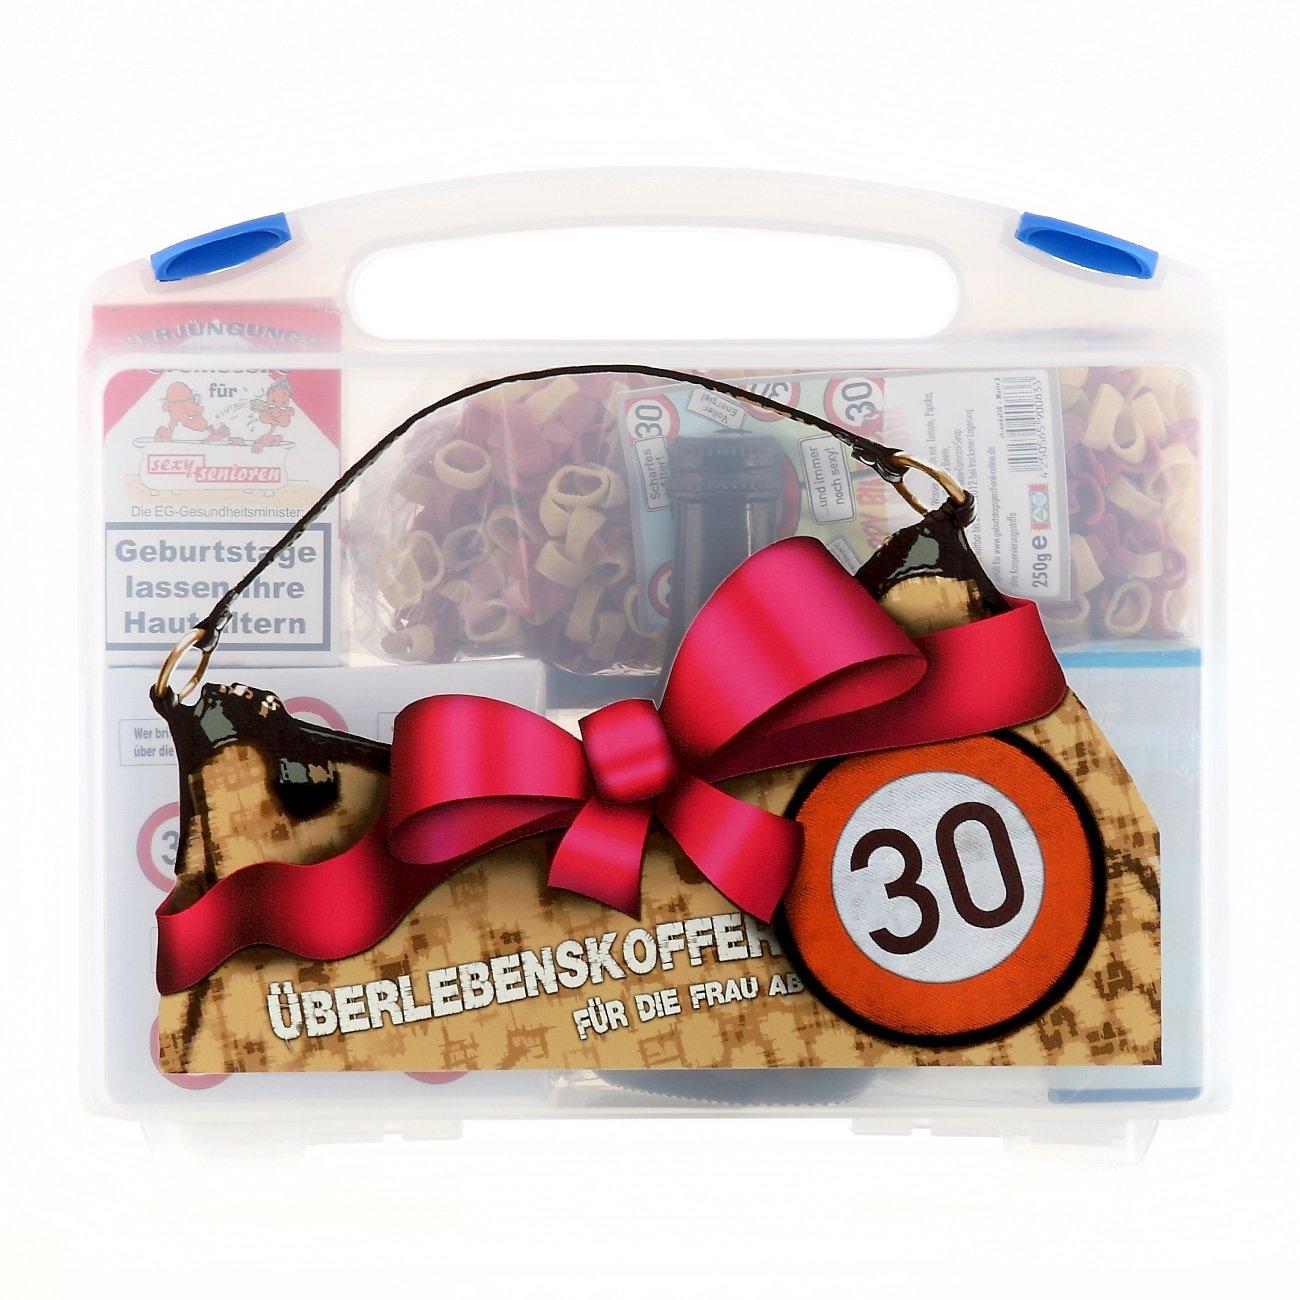 Lustige Apotheke Überlebenskoffer für die Frau ab 30 (8 teilig) Lustapotheke®